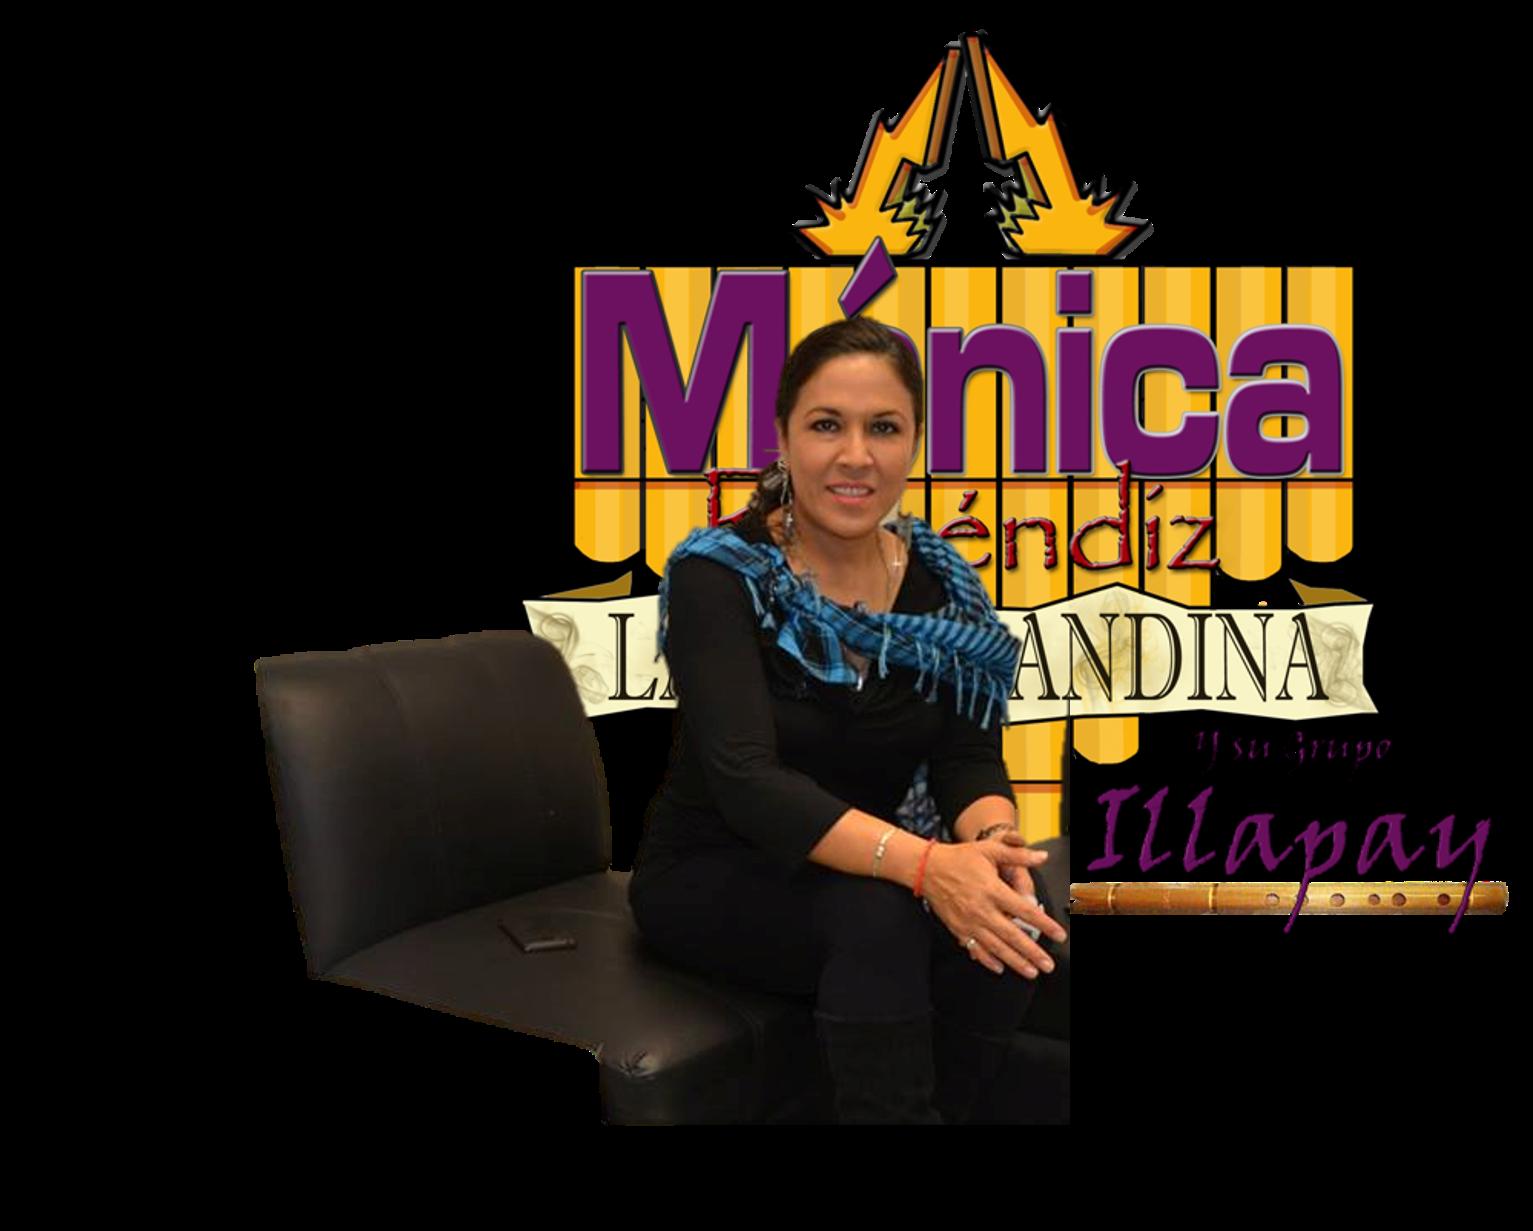 La Reina Andina Mónica Reséndiz